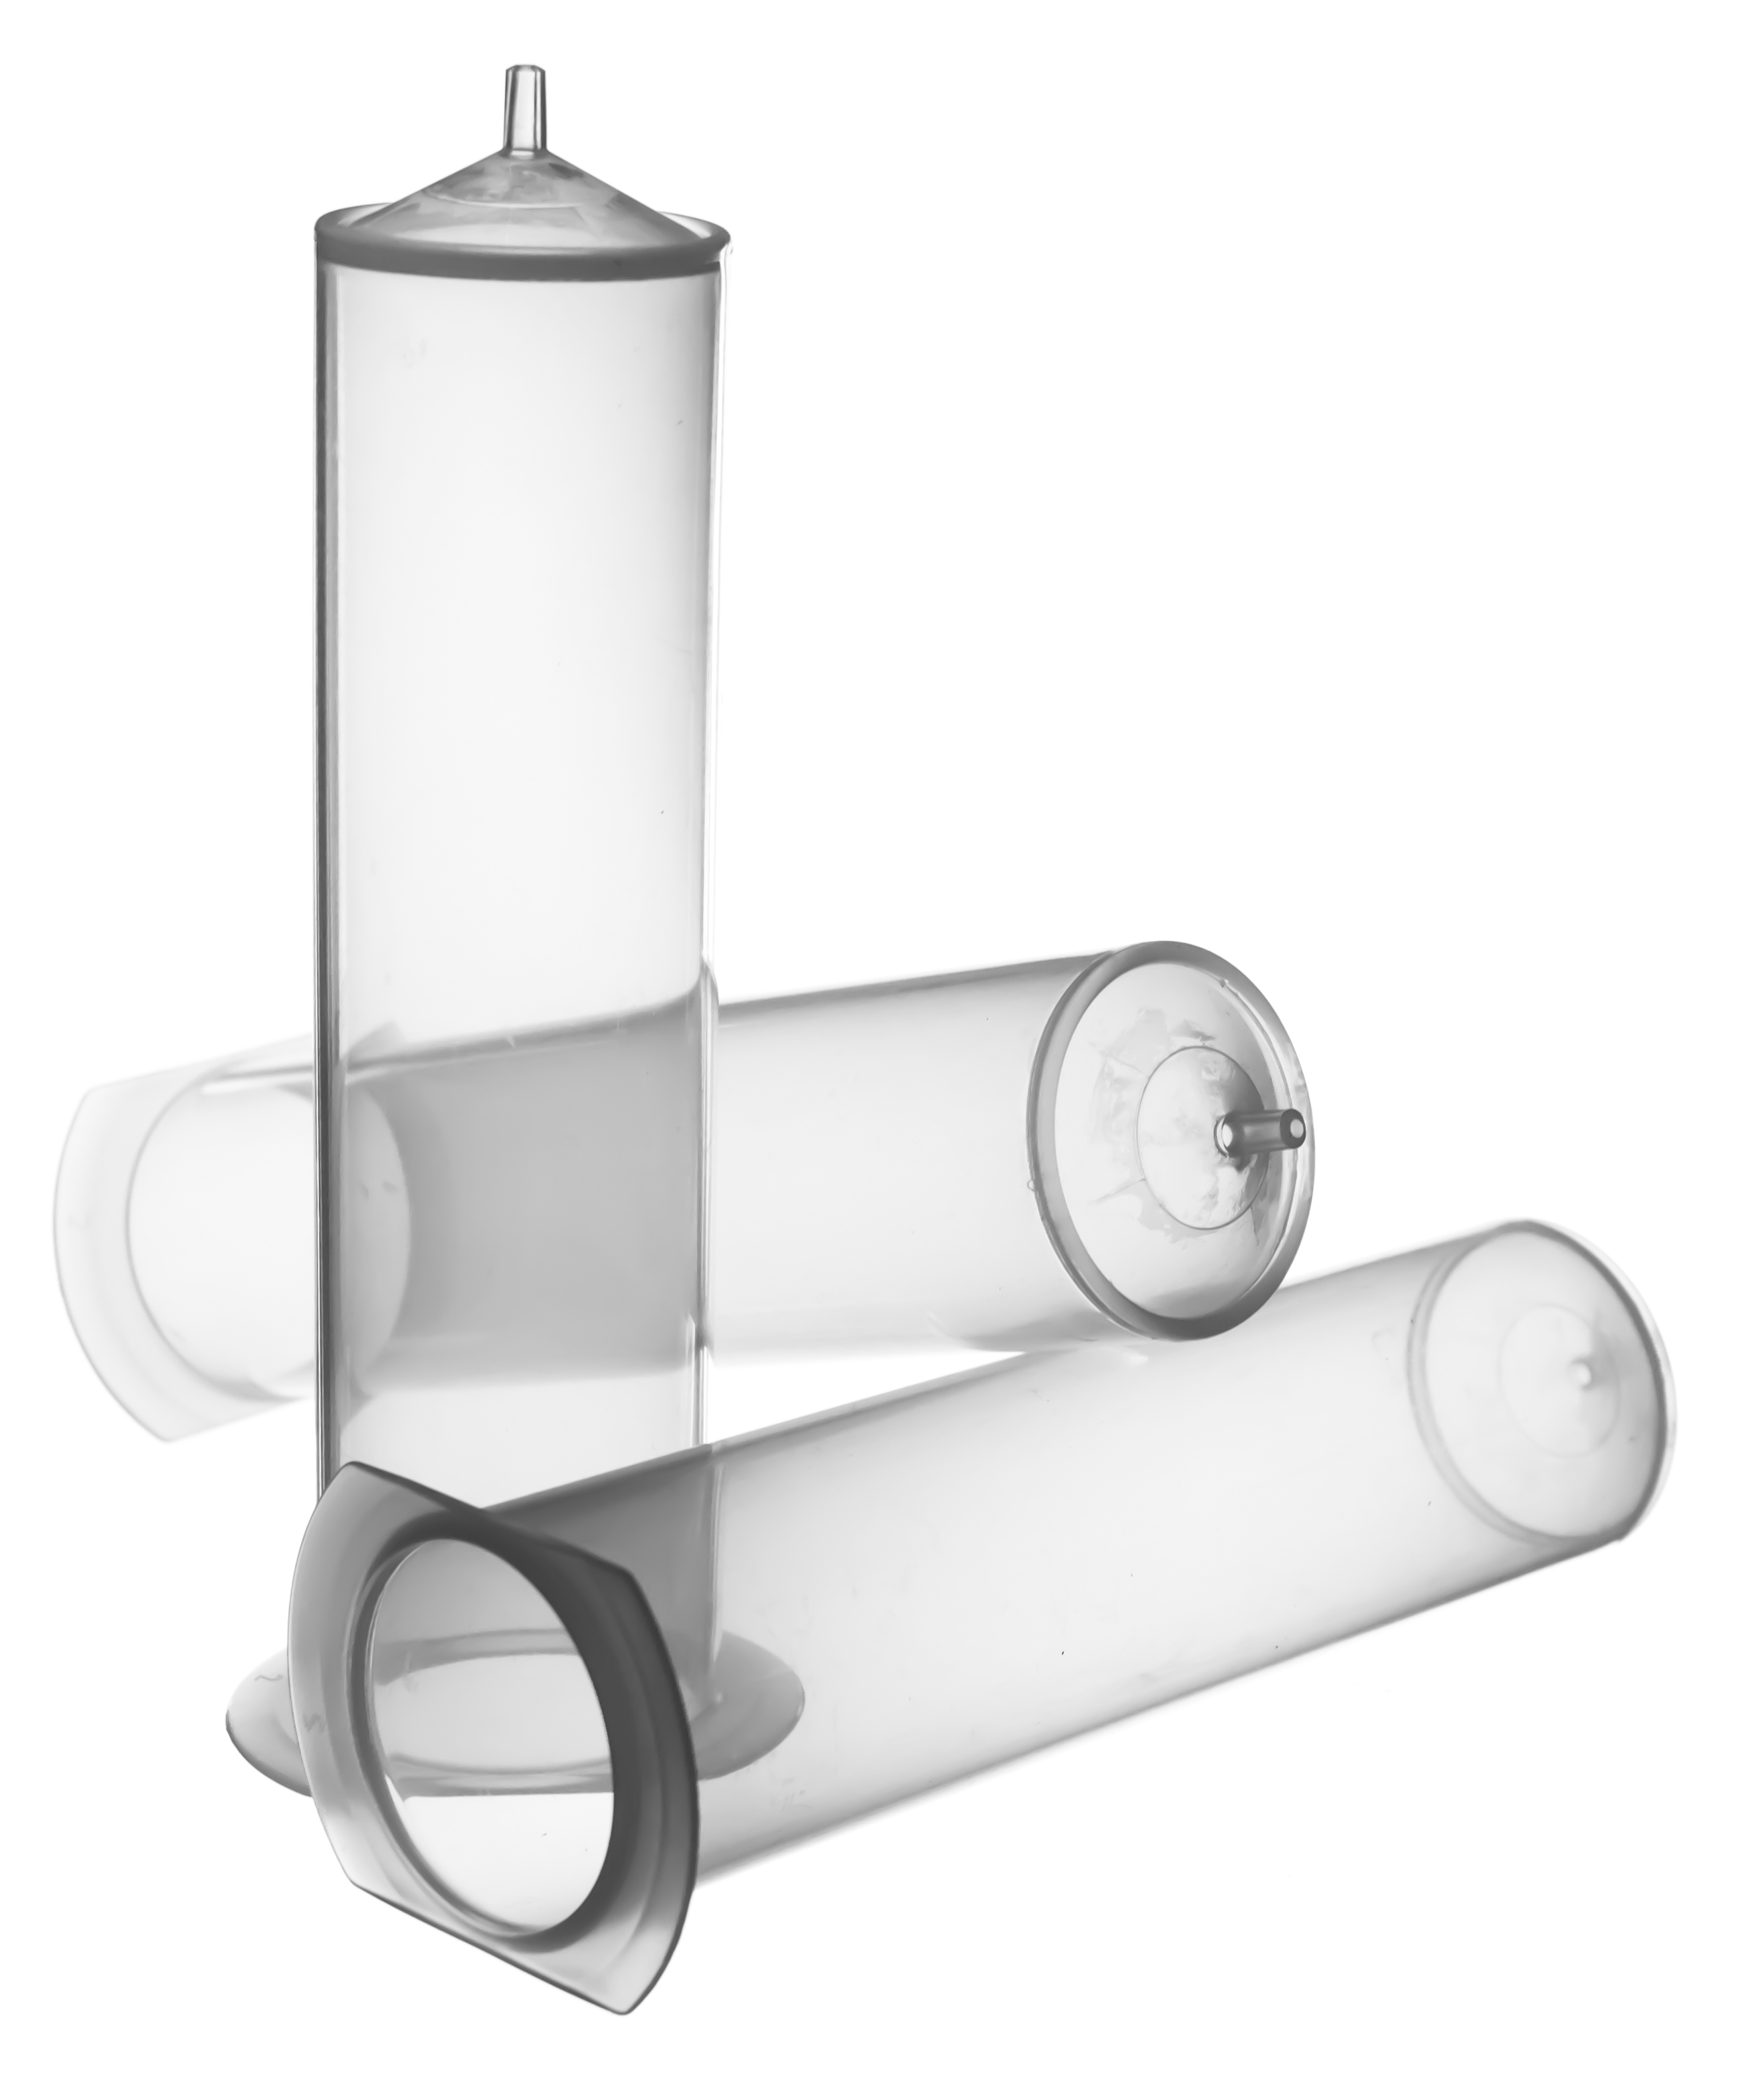 120-1010-J-a-ISOLUTE reservoir column 150 mL